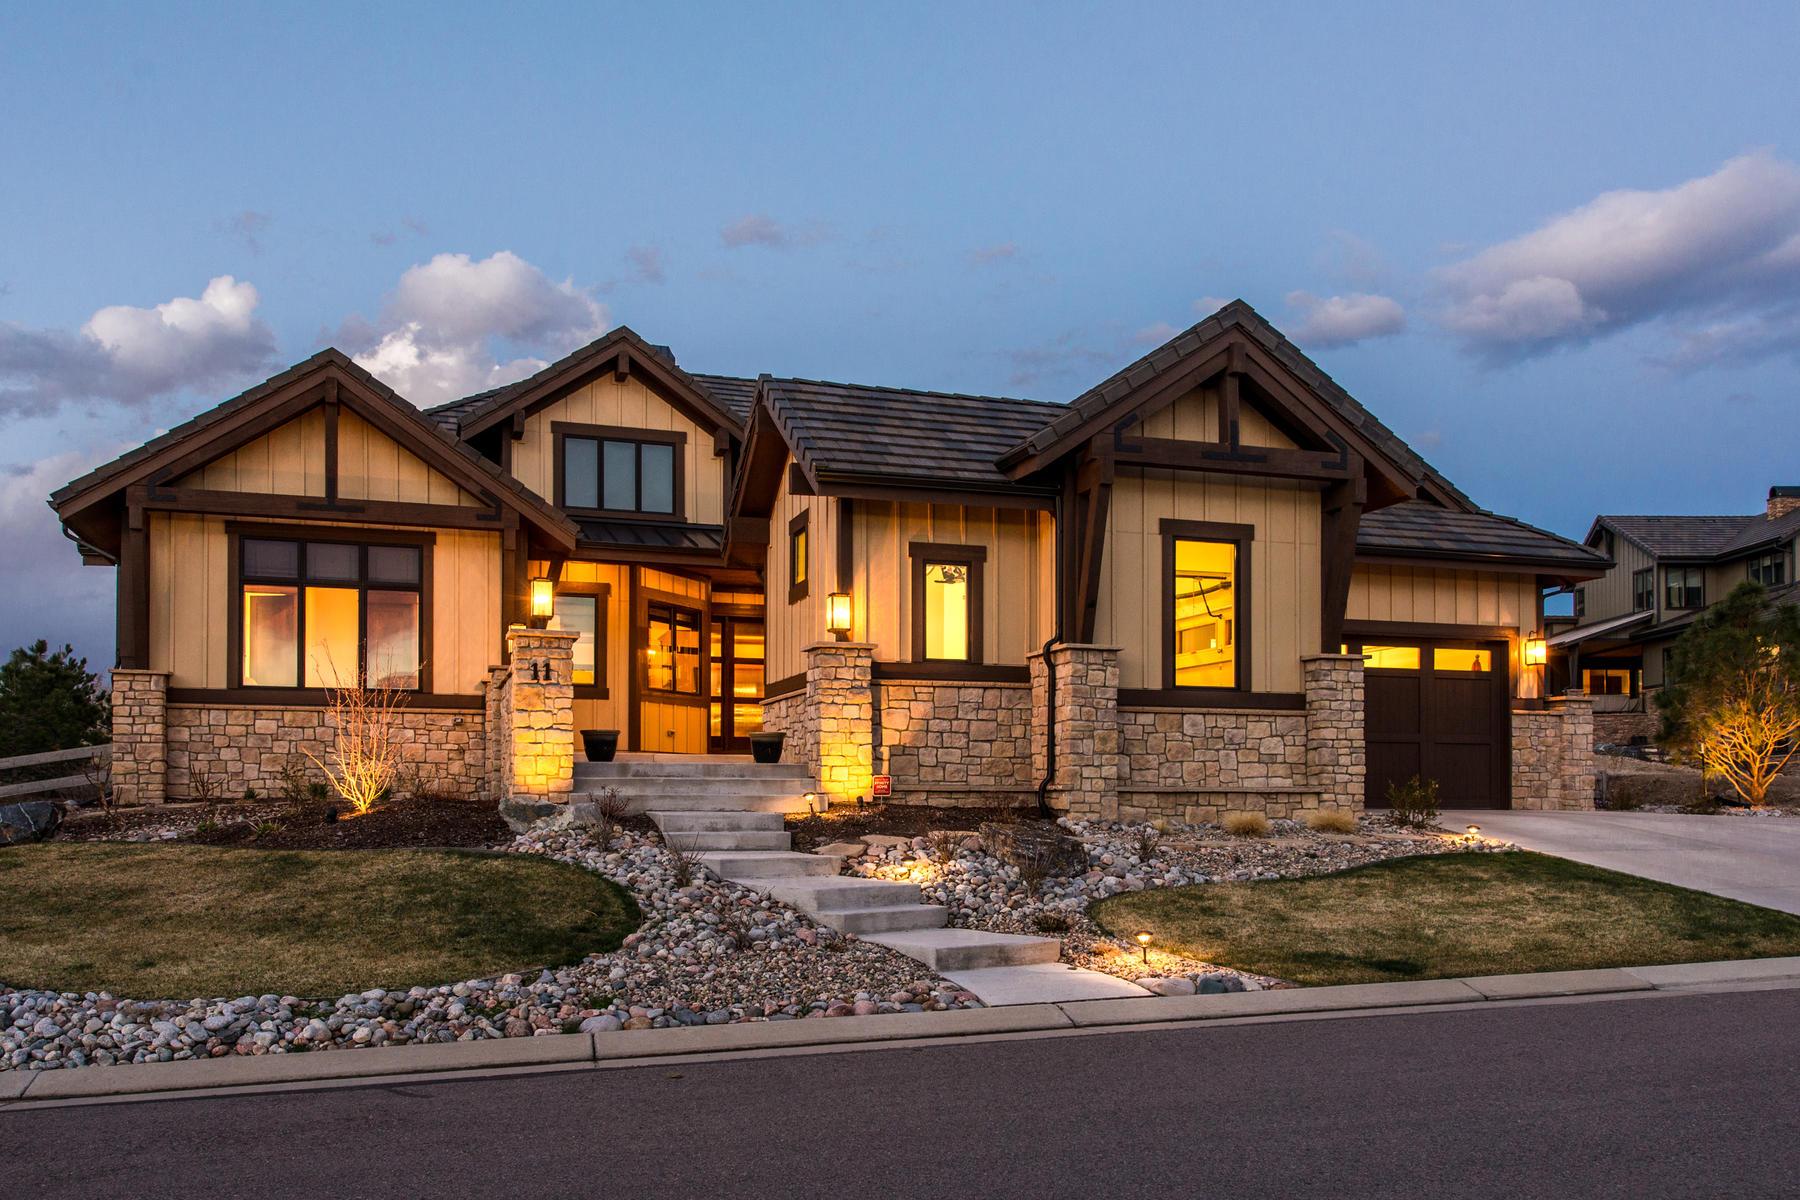 Einfamilienhaus für Verkauf beim The moment you enter this STUNNING Home you feel the quality! 11 Flowerburst Way, Backcountry, Highlands Ranch, Colorado, 80126 Vereinigte Staaten